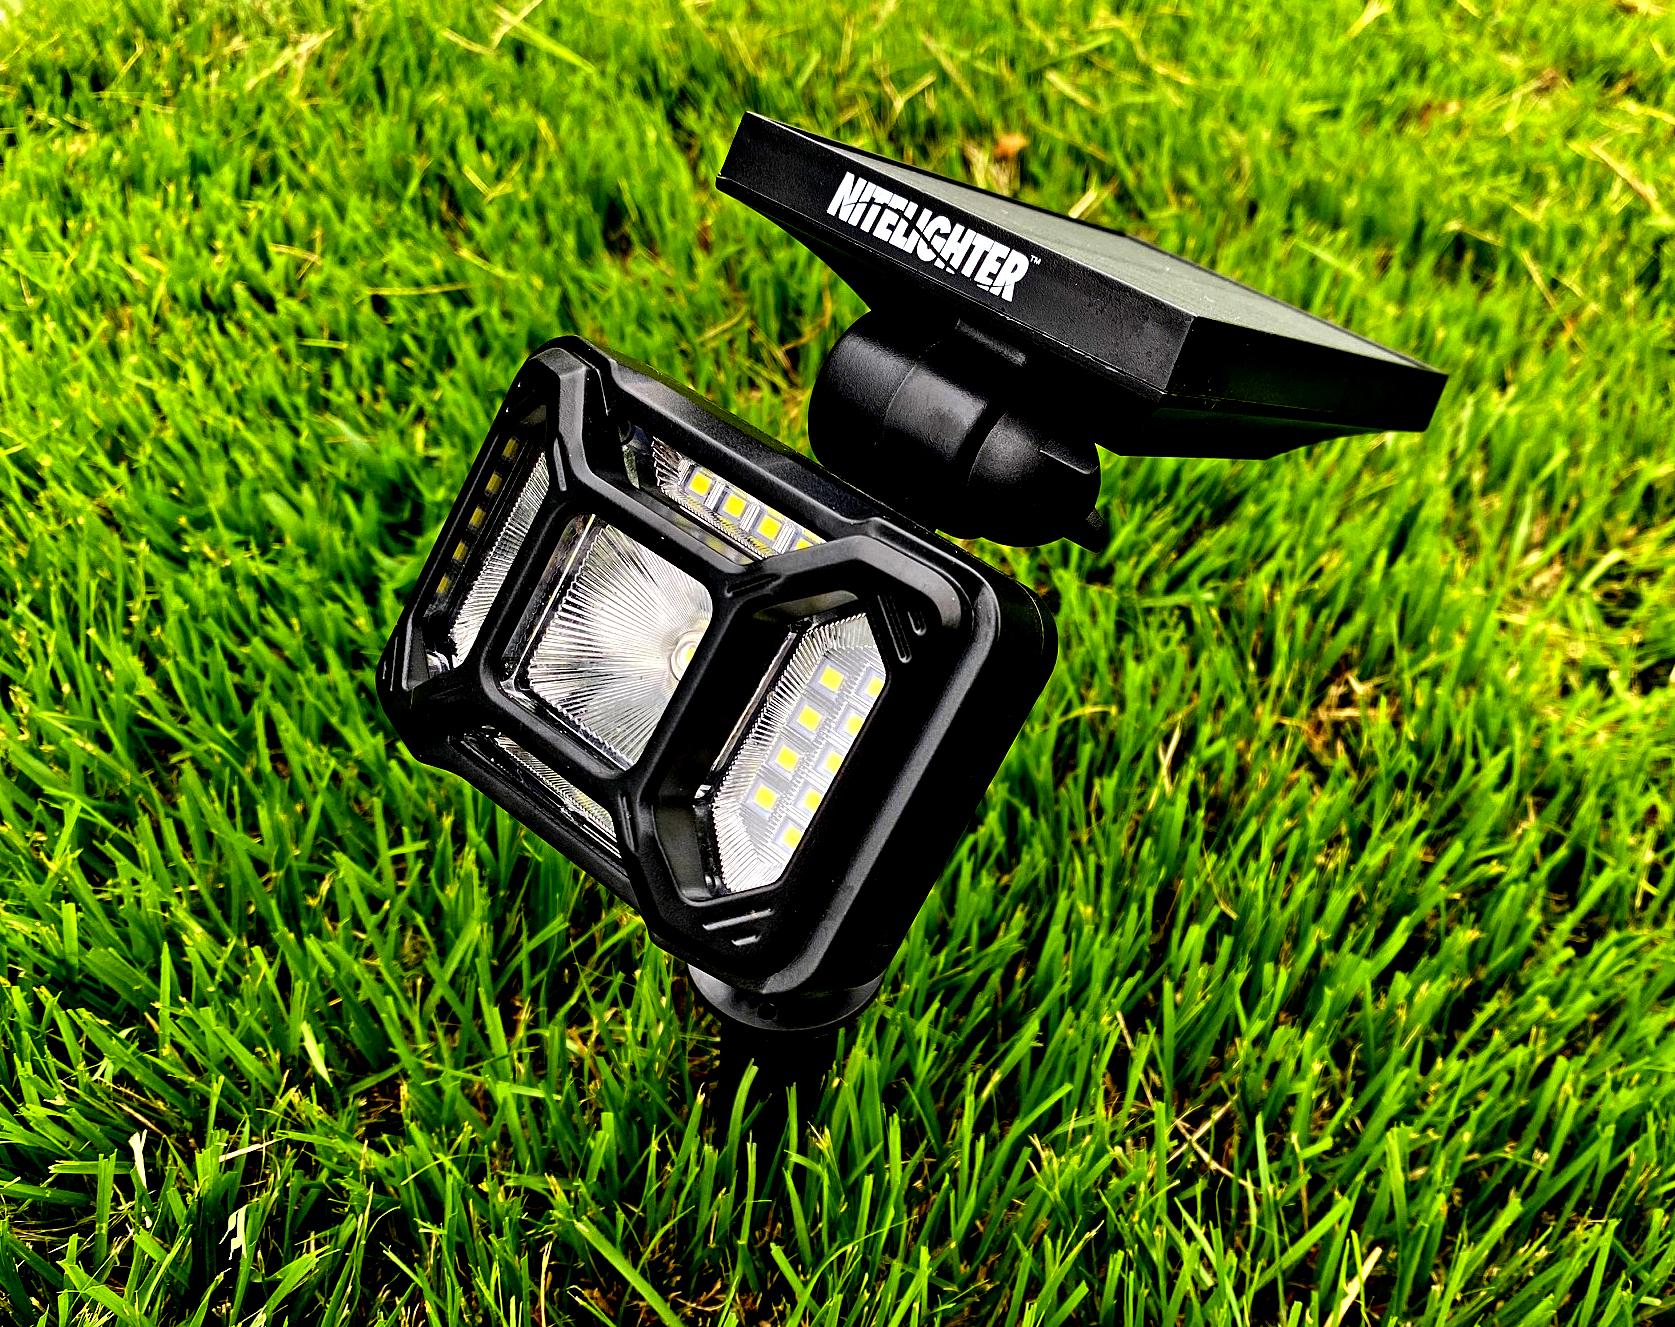 Landscape light in grass